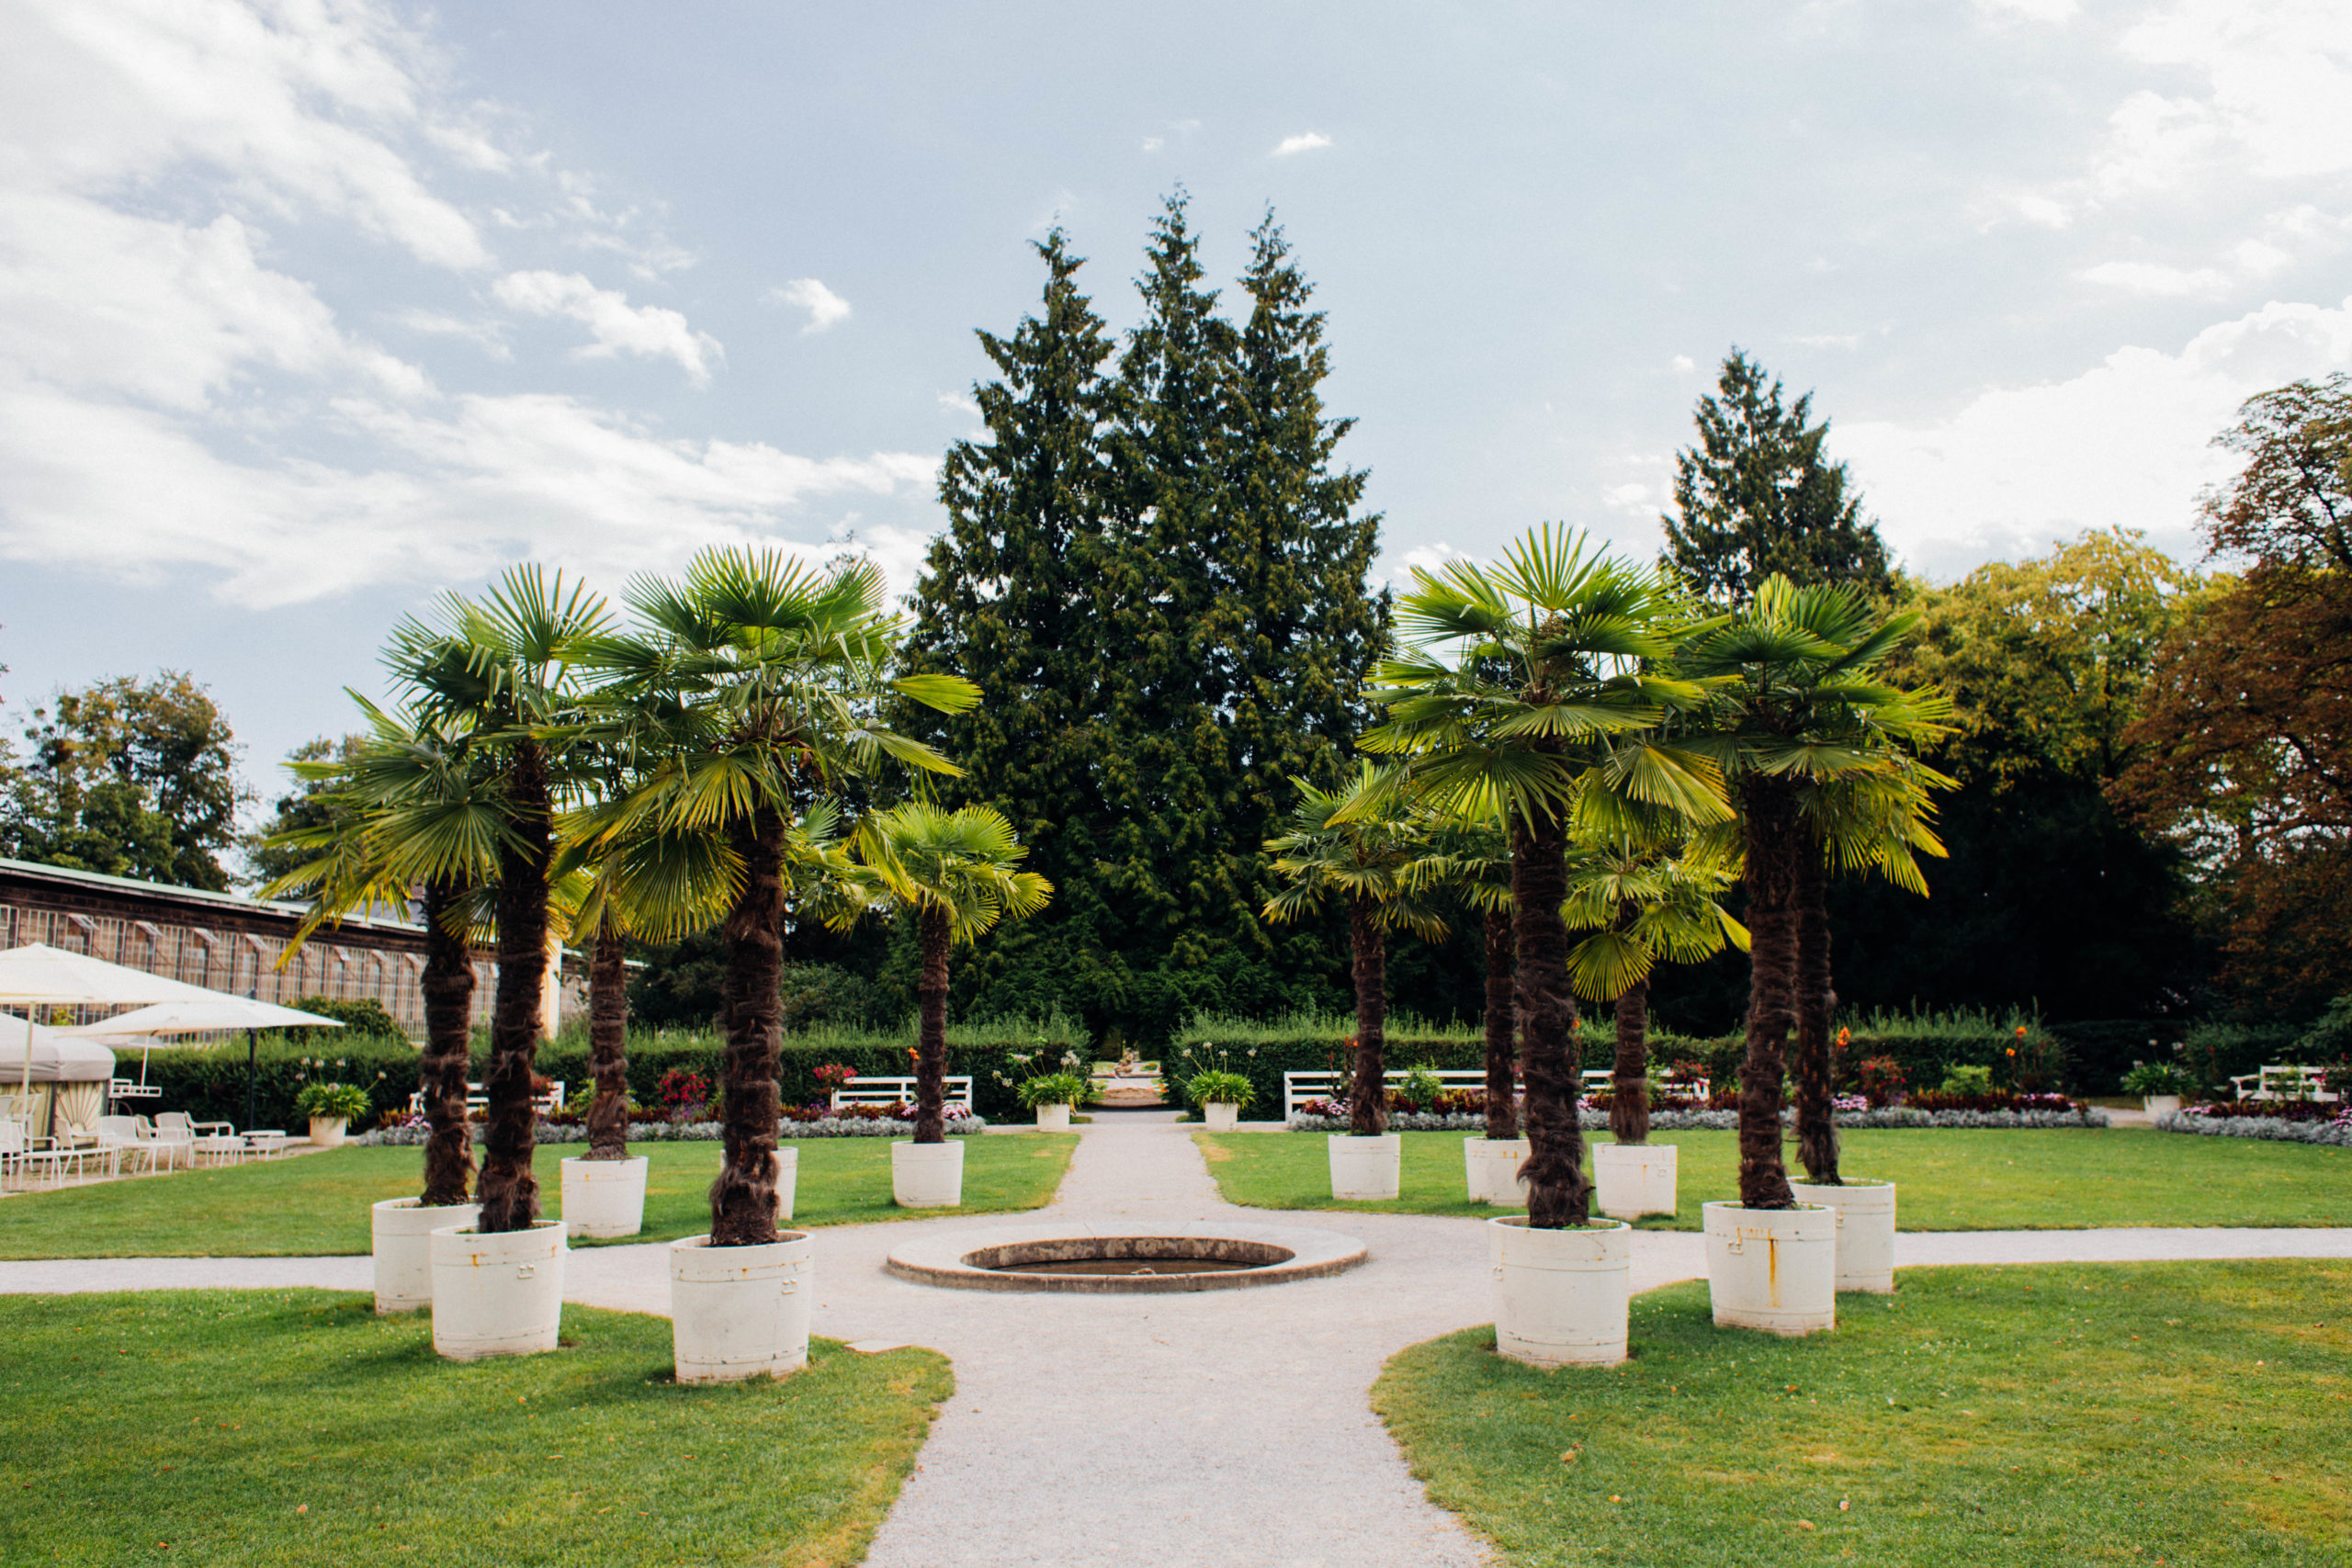 Palmenrondell im Schlosspark